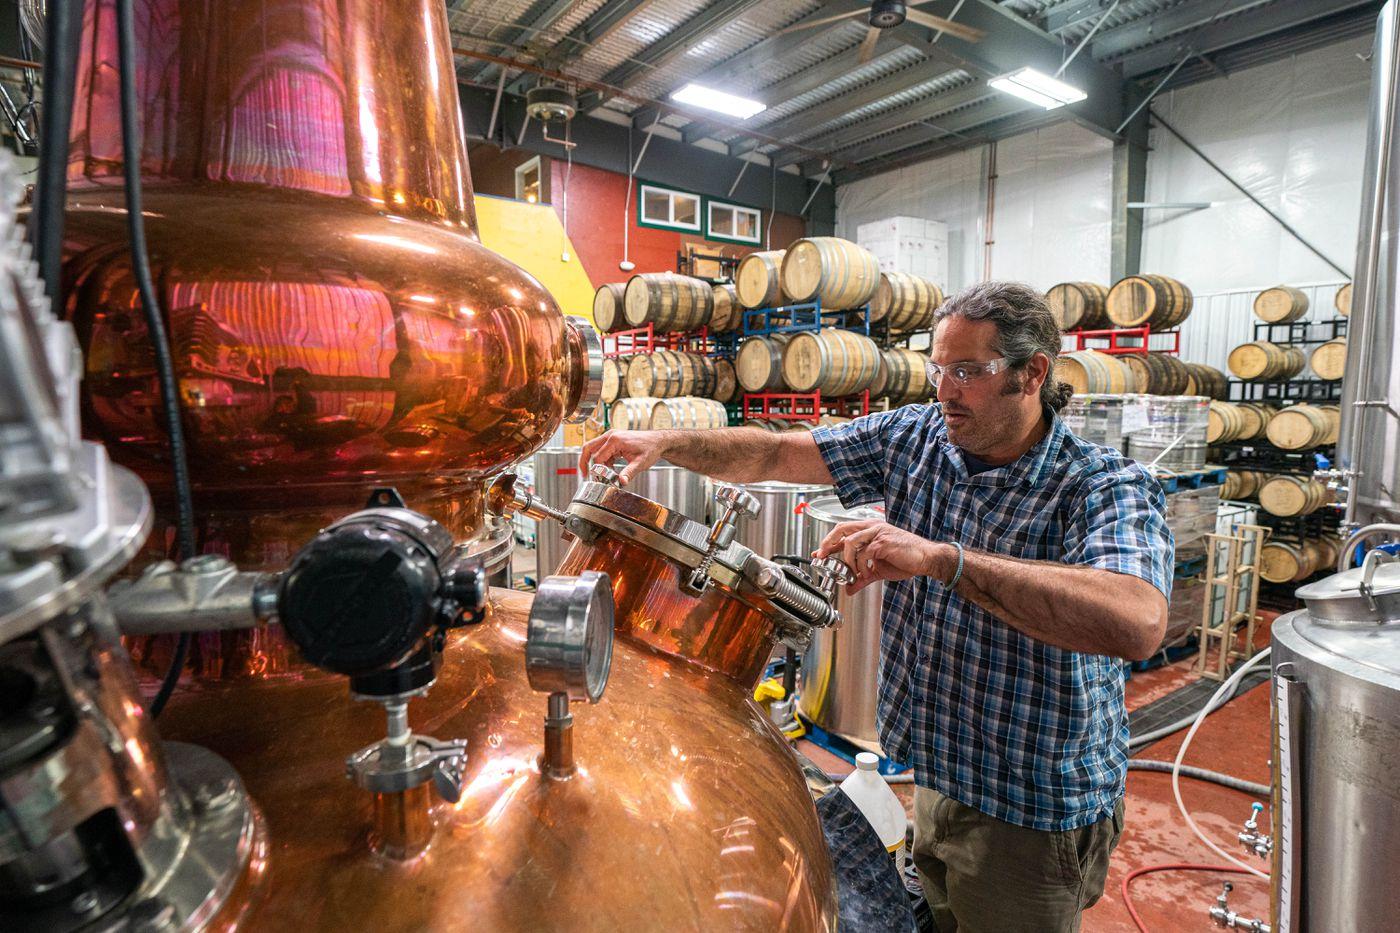 Denali Brewing owner Sassan Mossanen puts de-foamer in a still on Thursday, May 21, 2020 in Talkeetna. The brewery also operates a distillery and brewpub. (Loren Holmes / ADN)